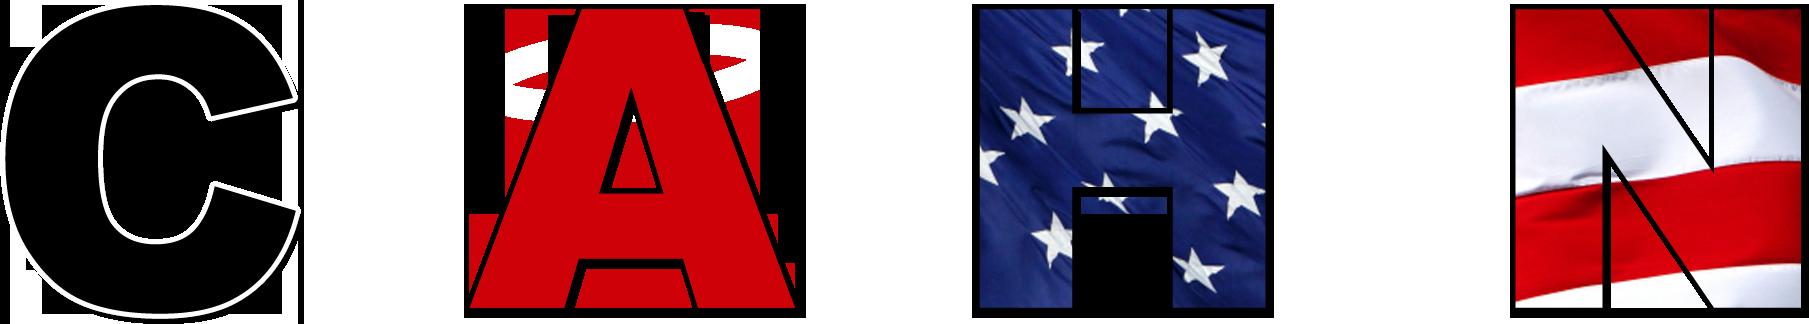 CAHN Flag LOGO